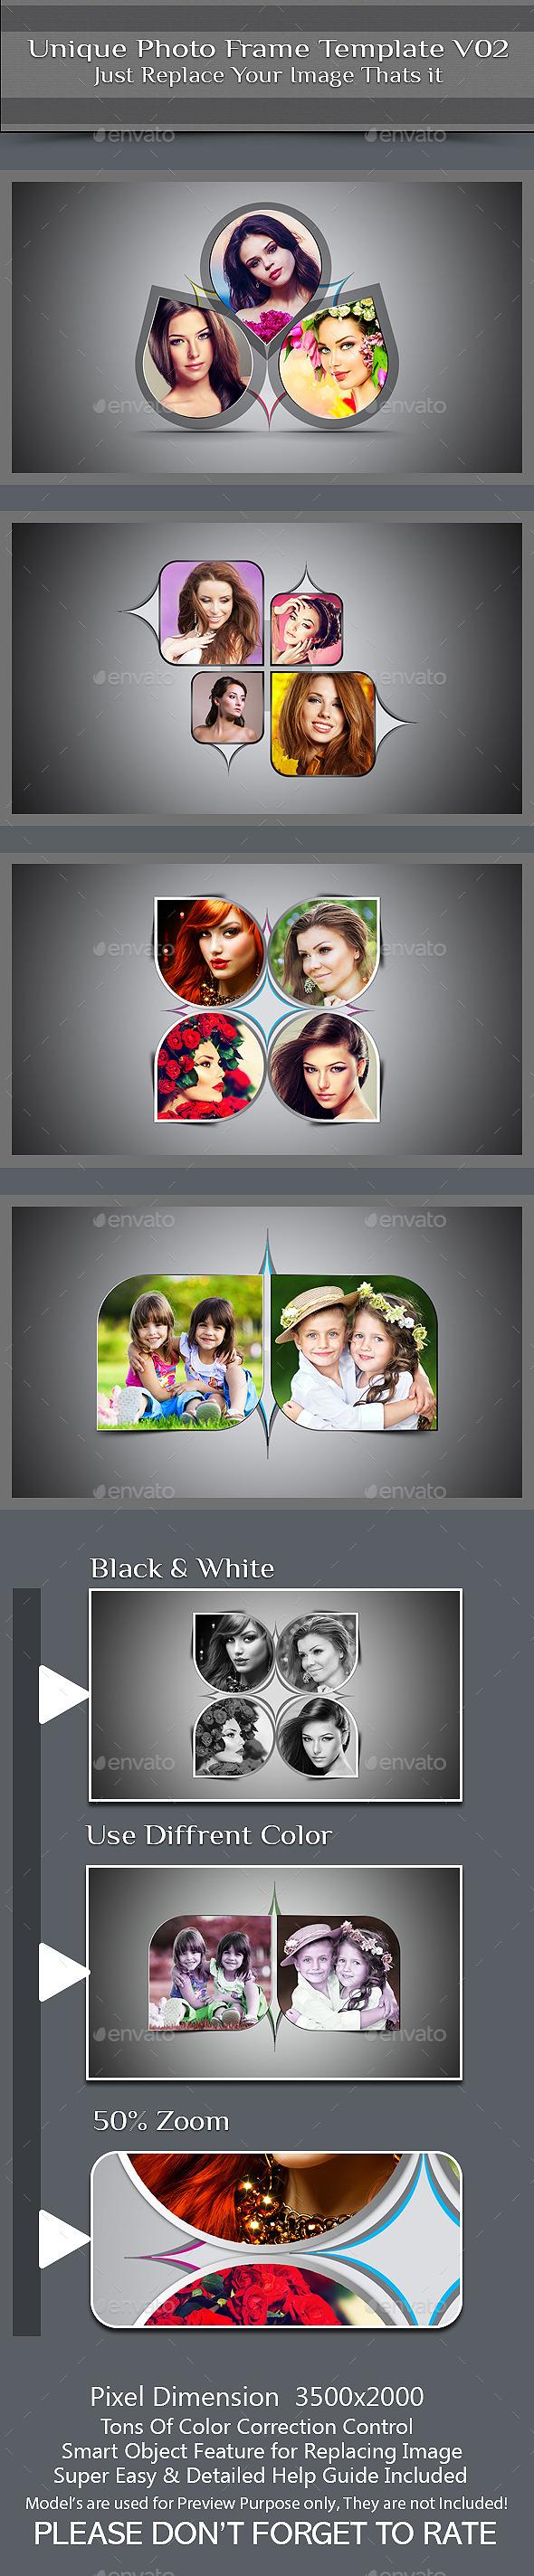 Unique Photo Frame Template V02 - Photo Templates Graphics